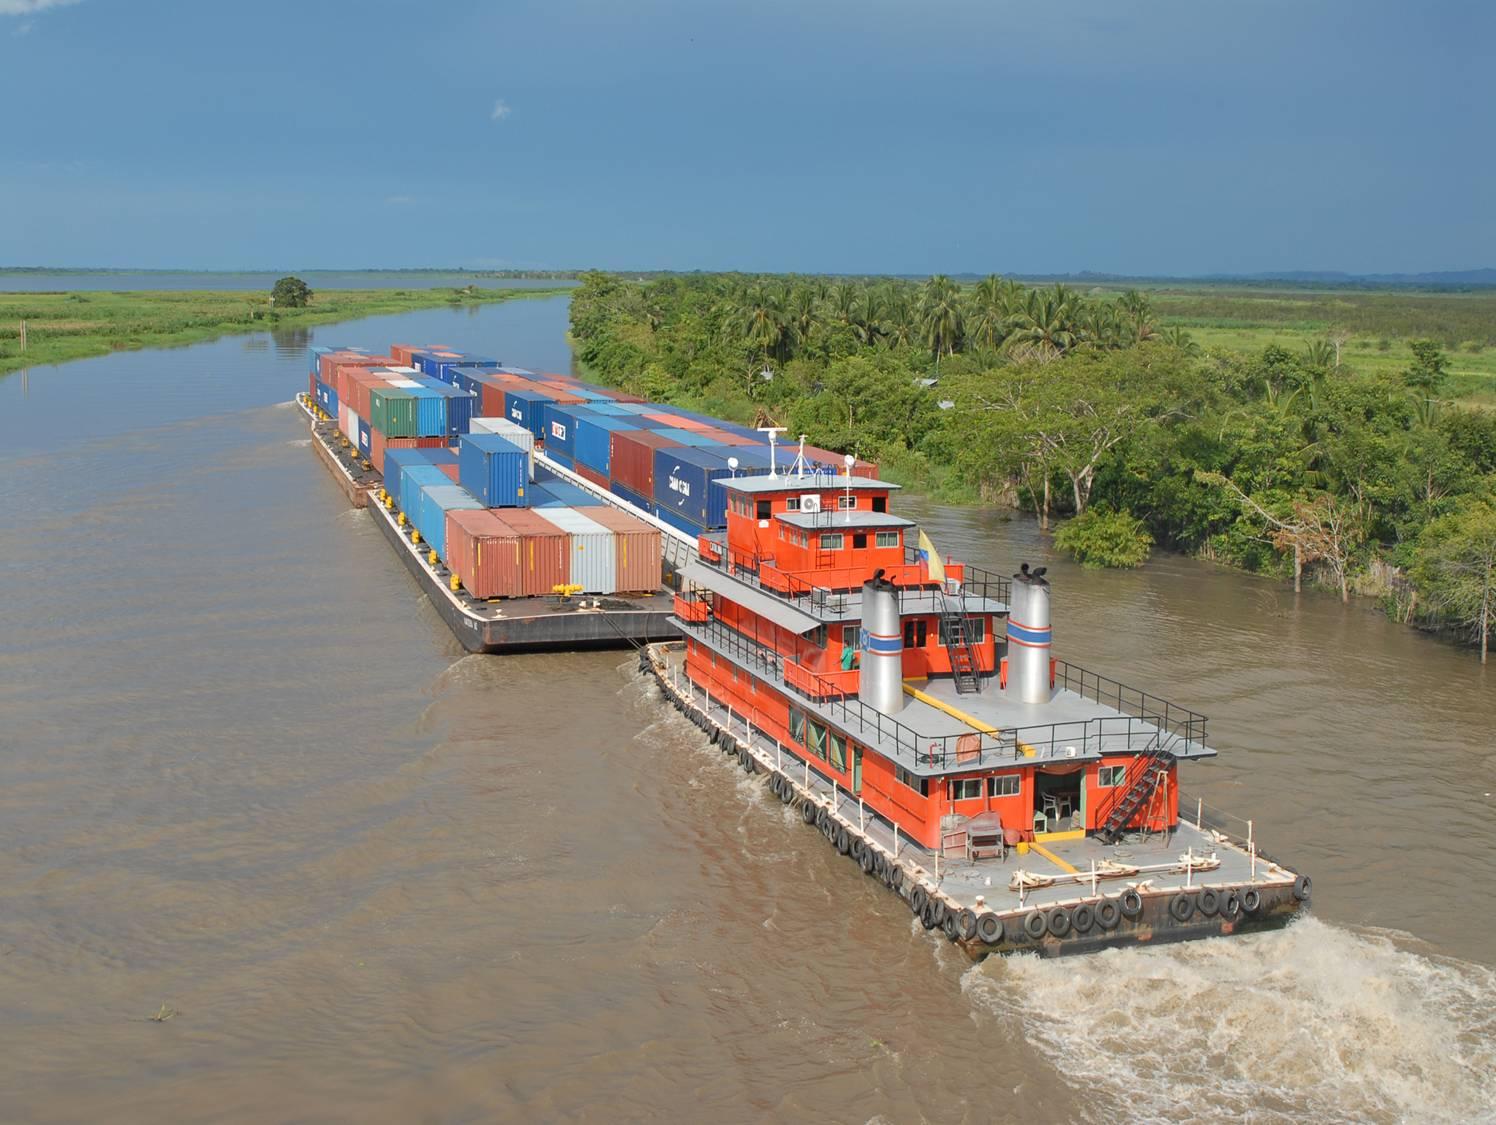 Aguas disminuyen en Barrancabermeja. Baja navegabilidad en el río Magdalena | EL FRENTE